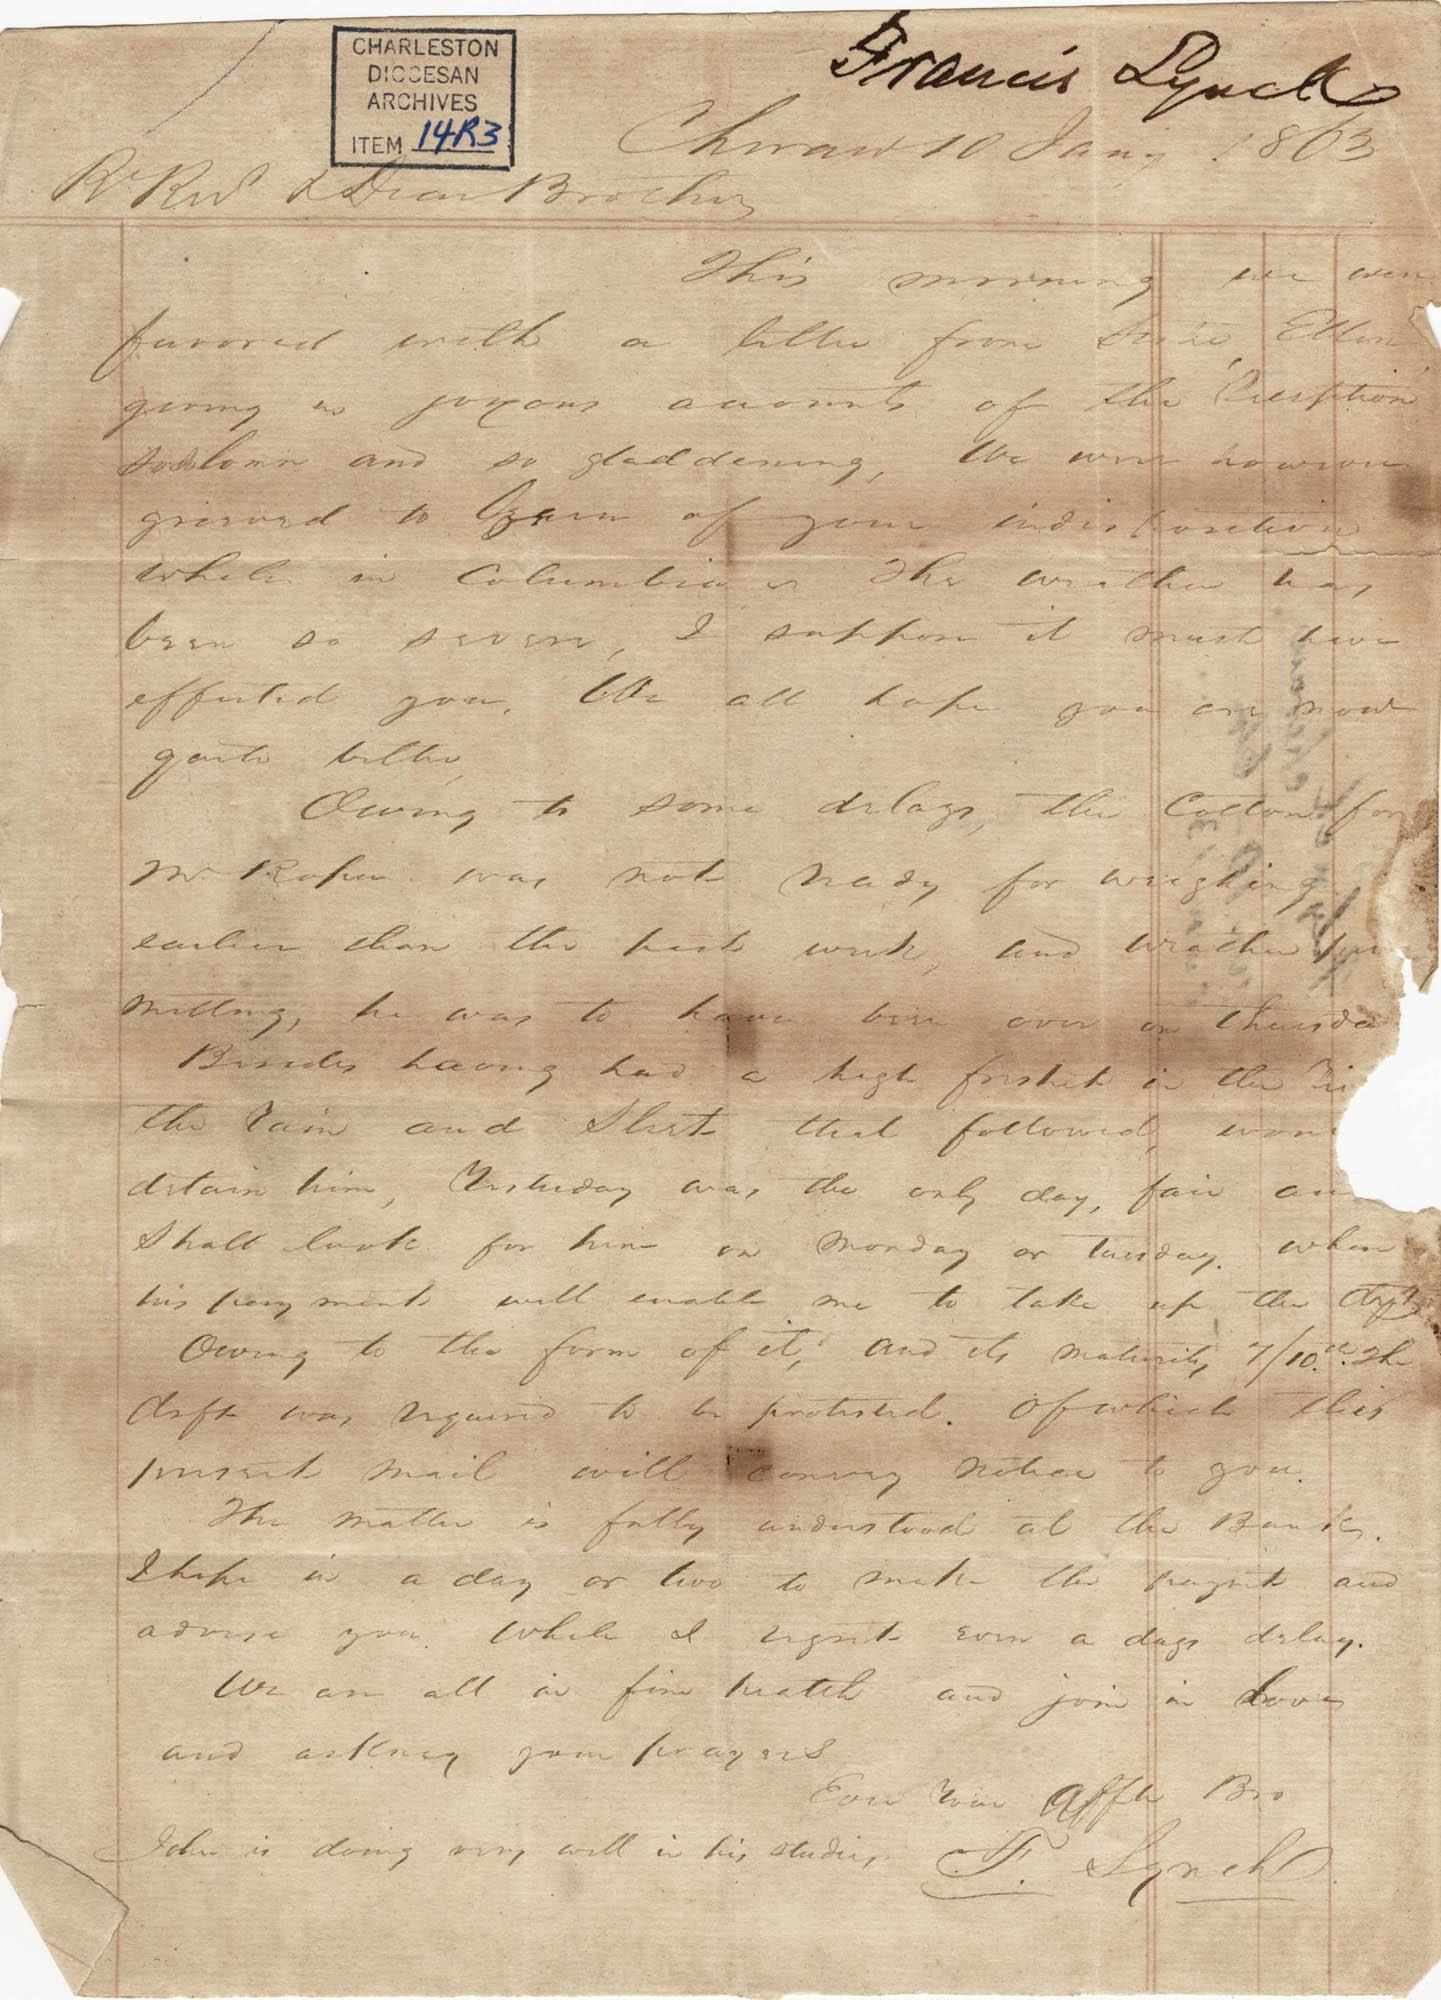 258. Francis Lynch to Bp Patrick Lynch -- January 10, 1863